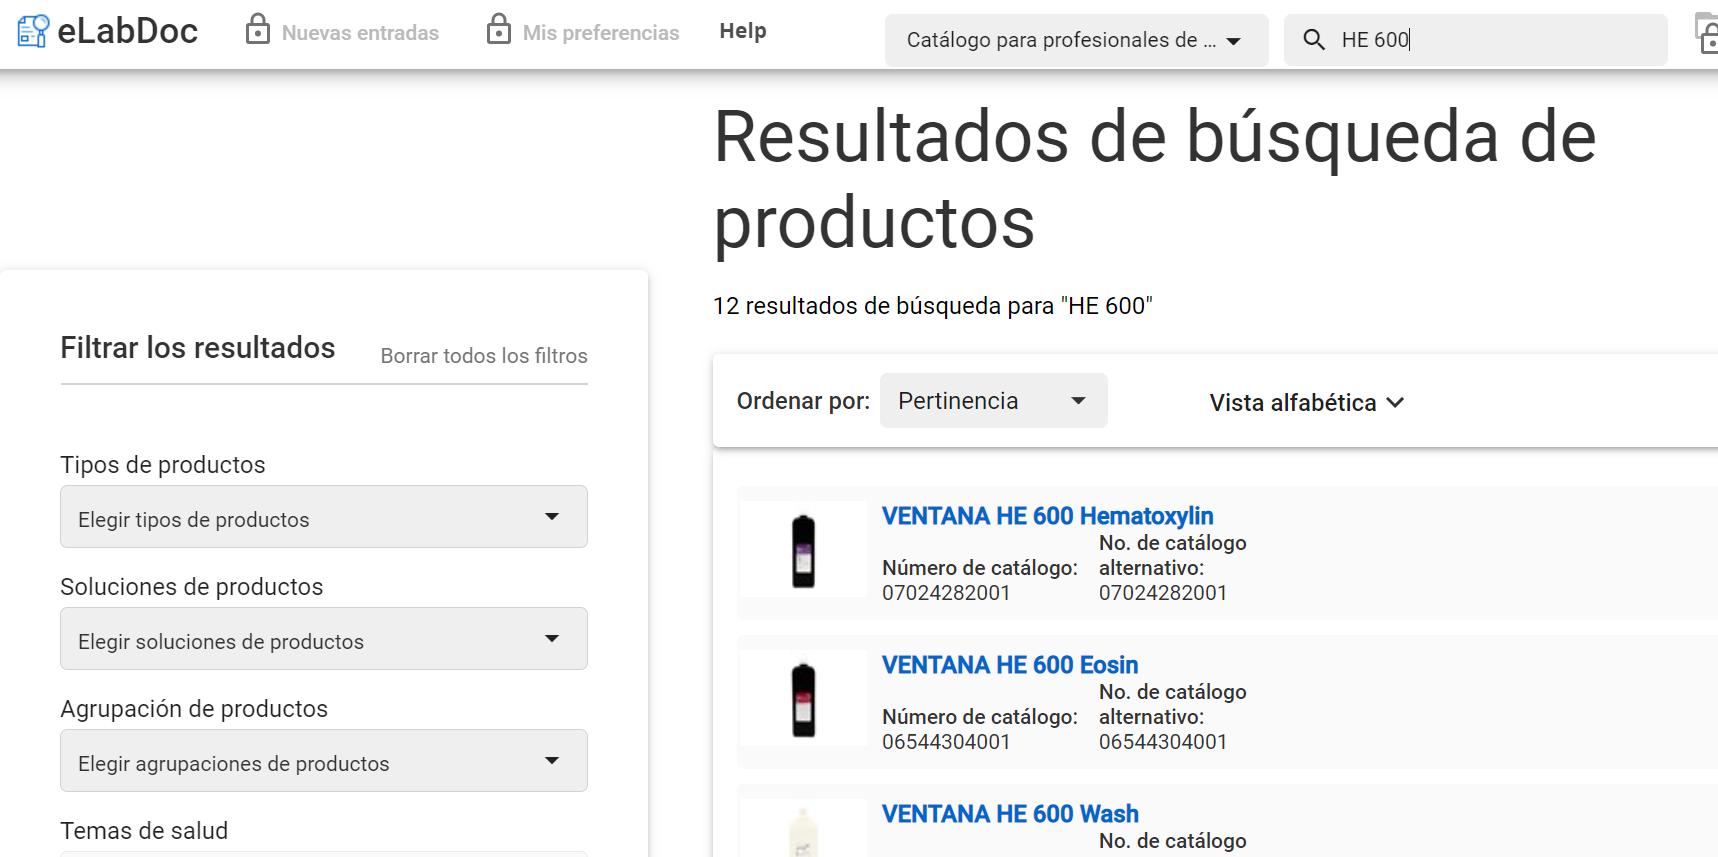 Roche VENTANA HE 600 product results in eLabDoc